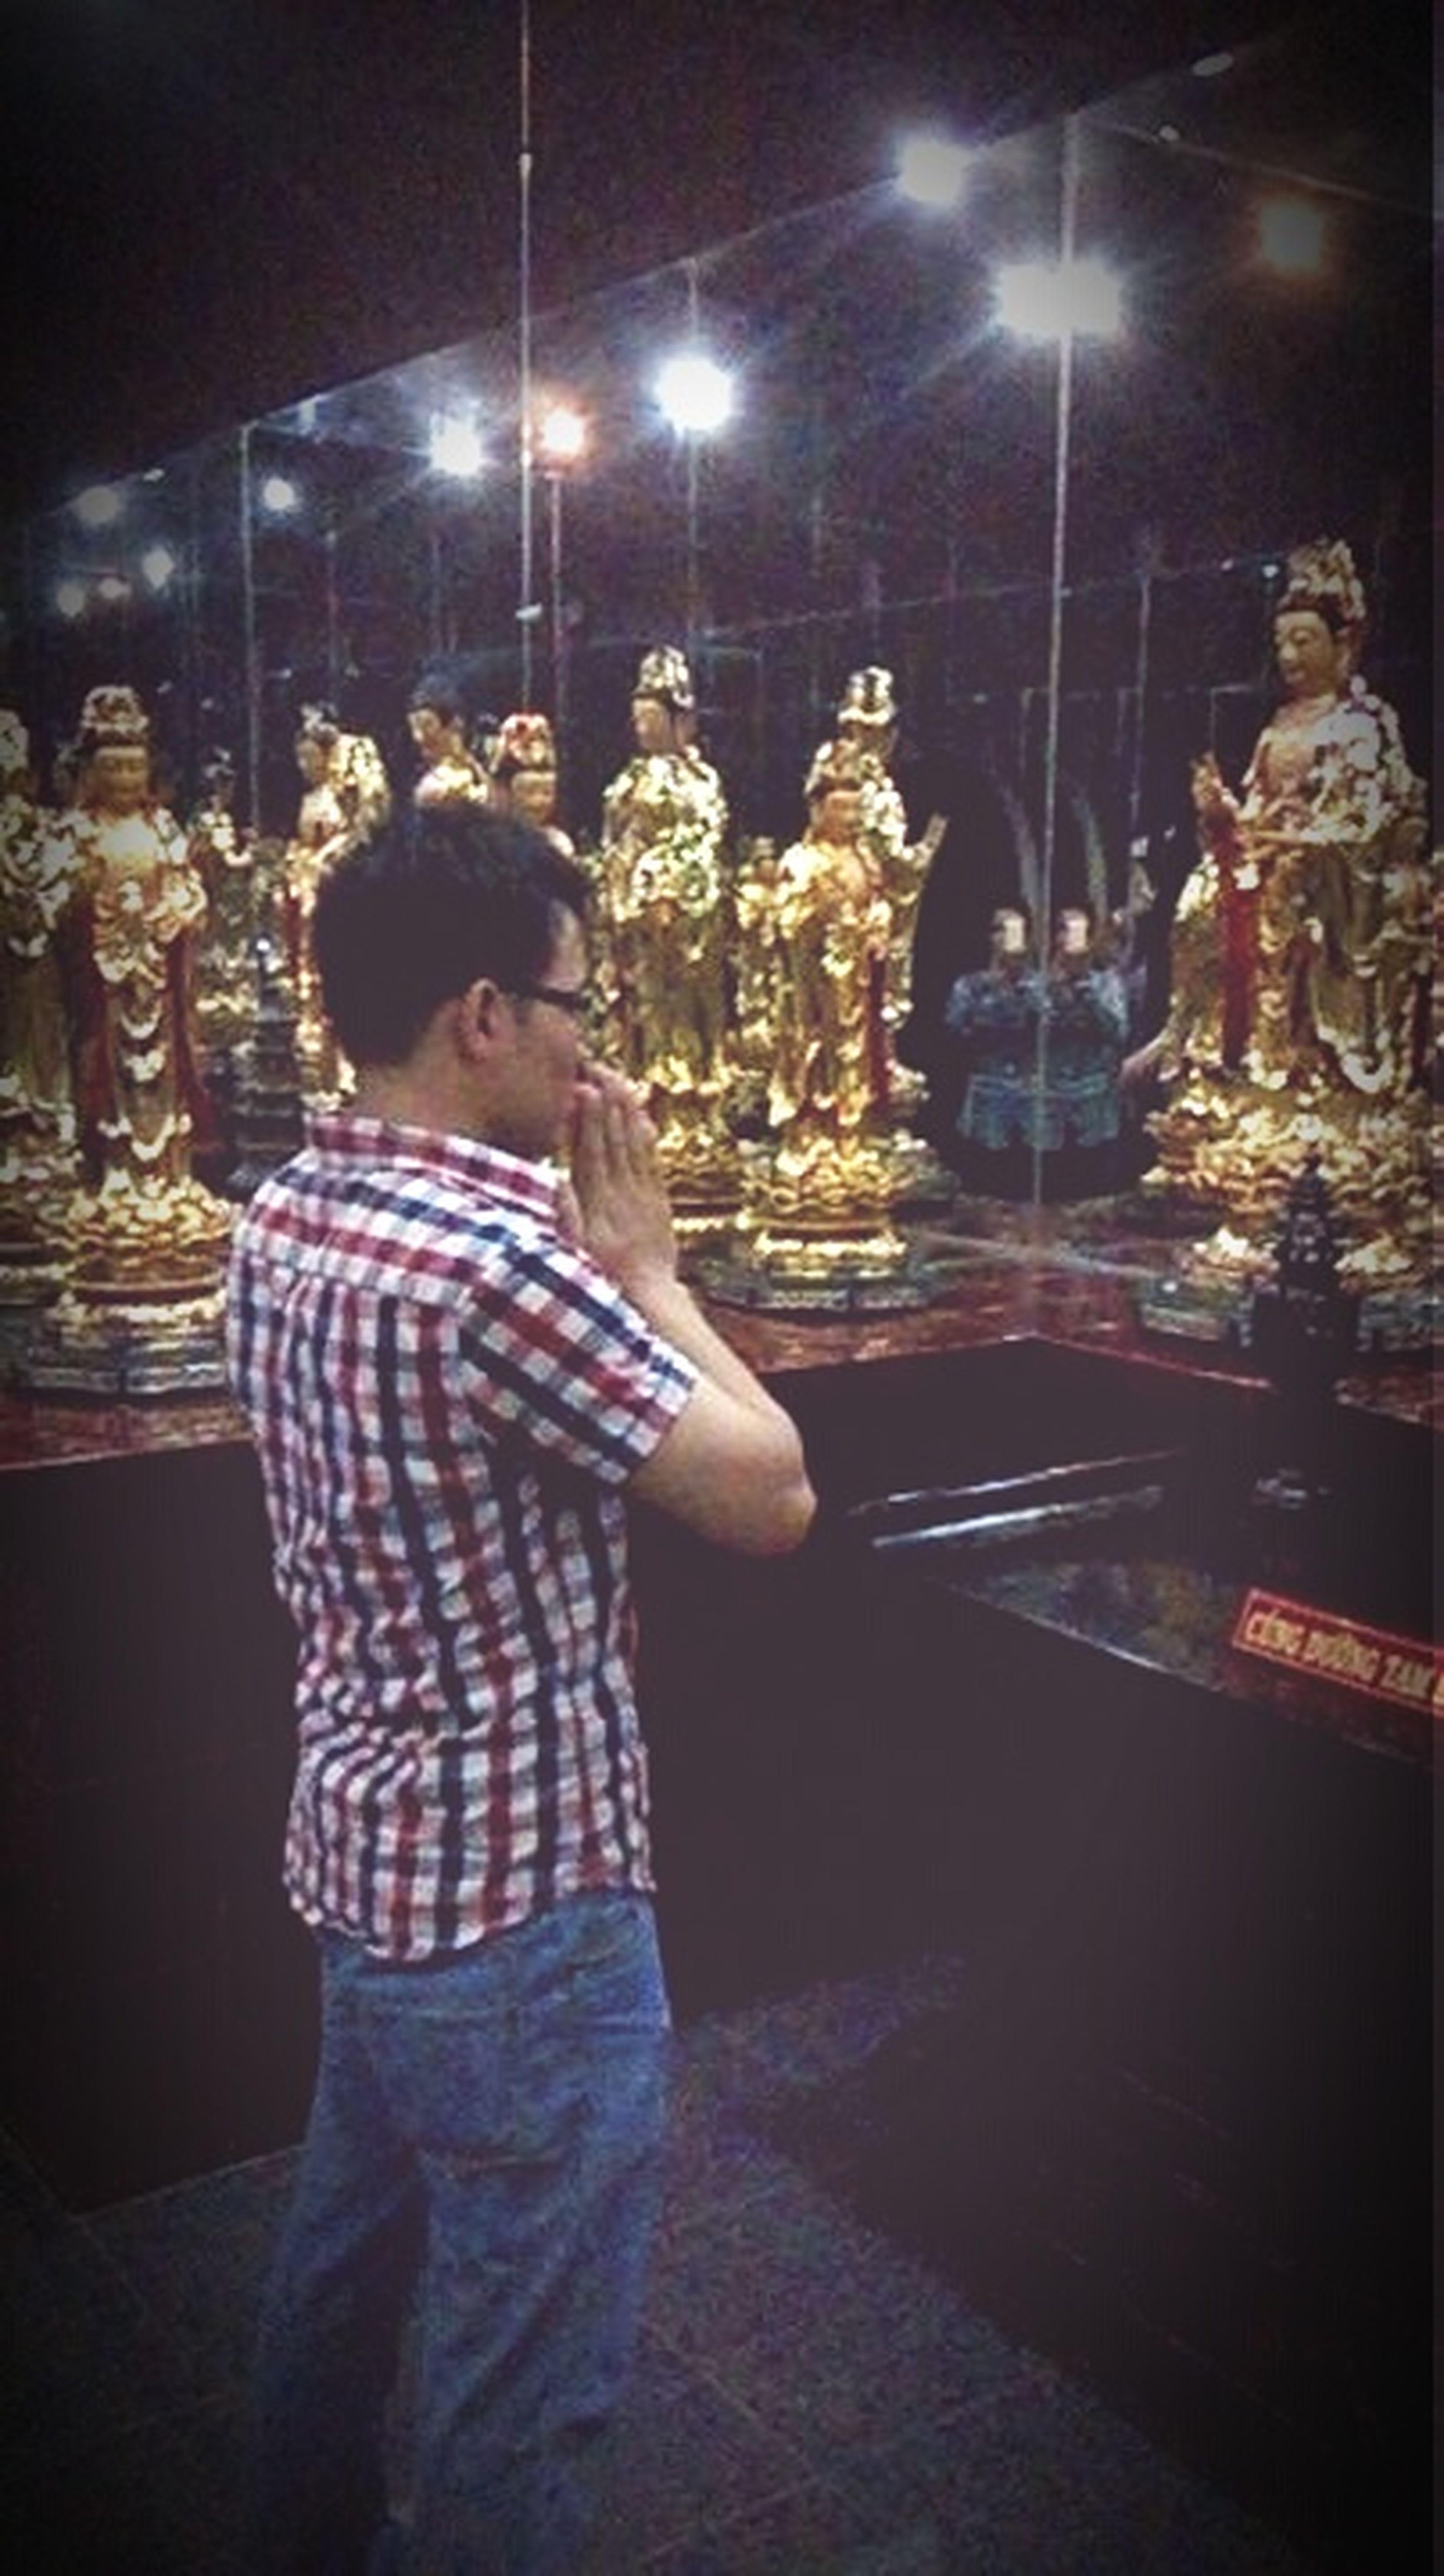 Cầu xin... Budha Petition Cầu Xin Phat Phật Giáo Chùa Hang An Giang Núi Sam Mountain Nui